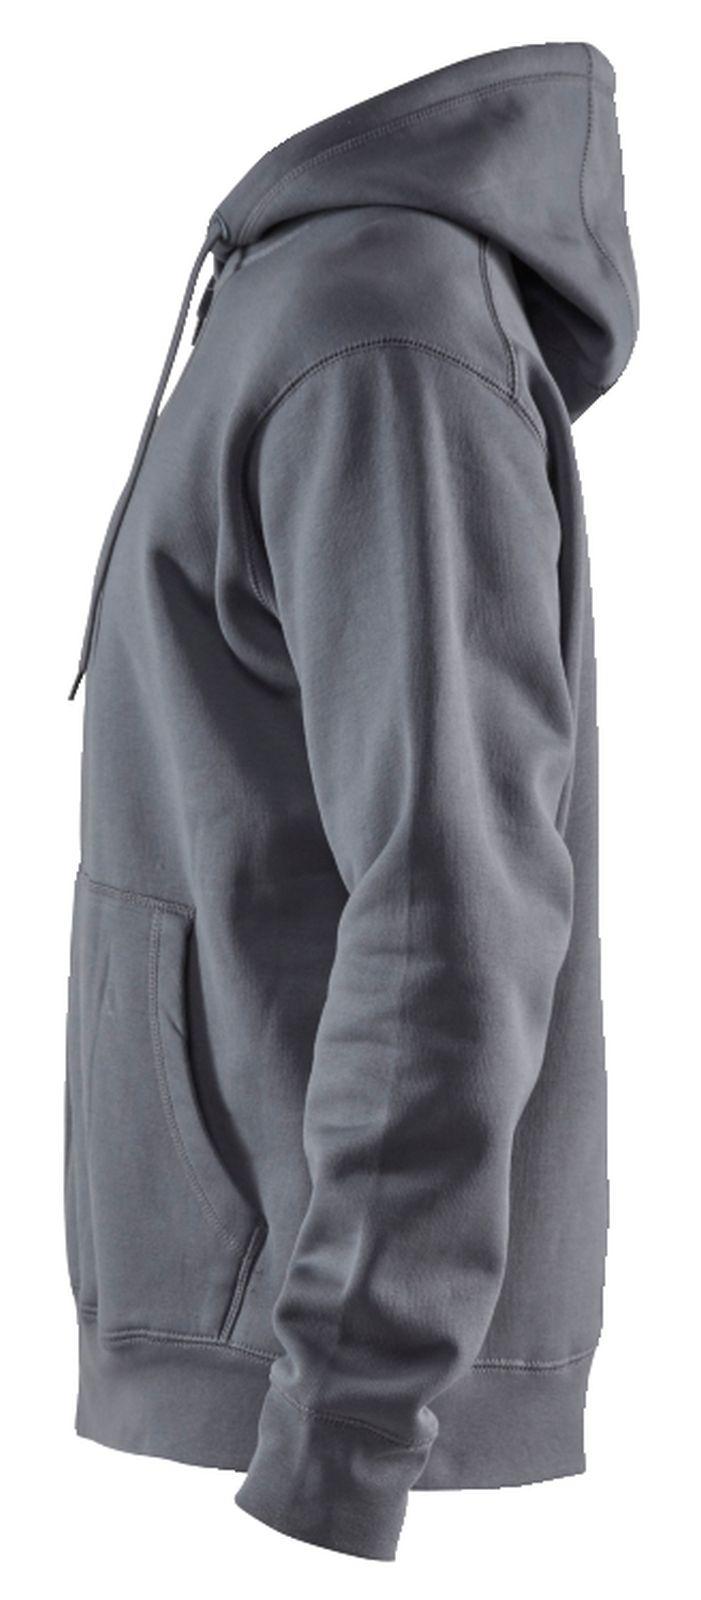 Blaklader Hooded sweatshirts 33961048 grijs(9400)